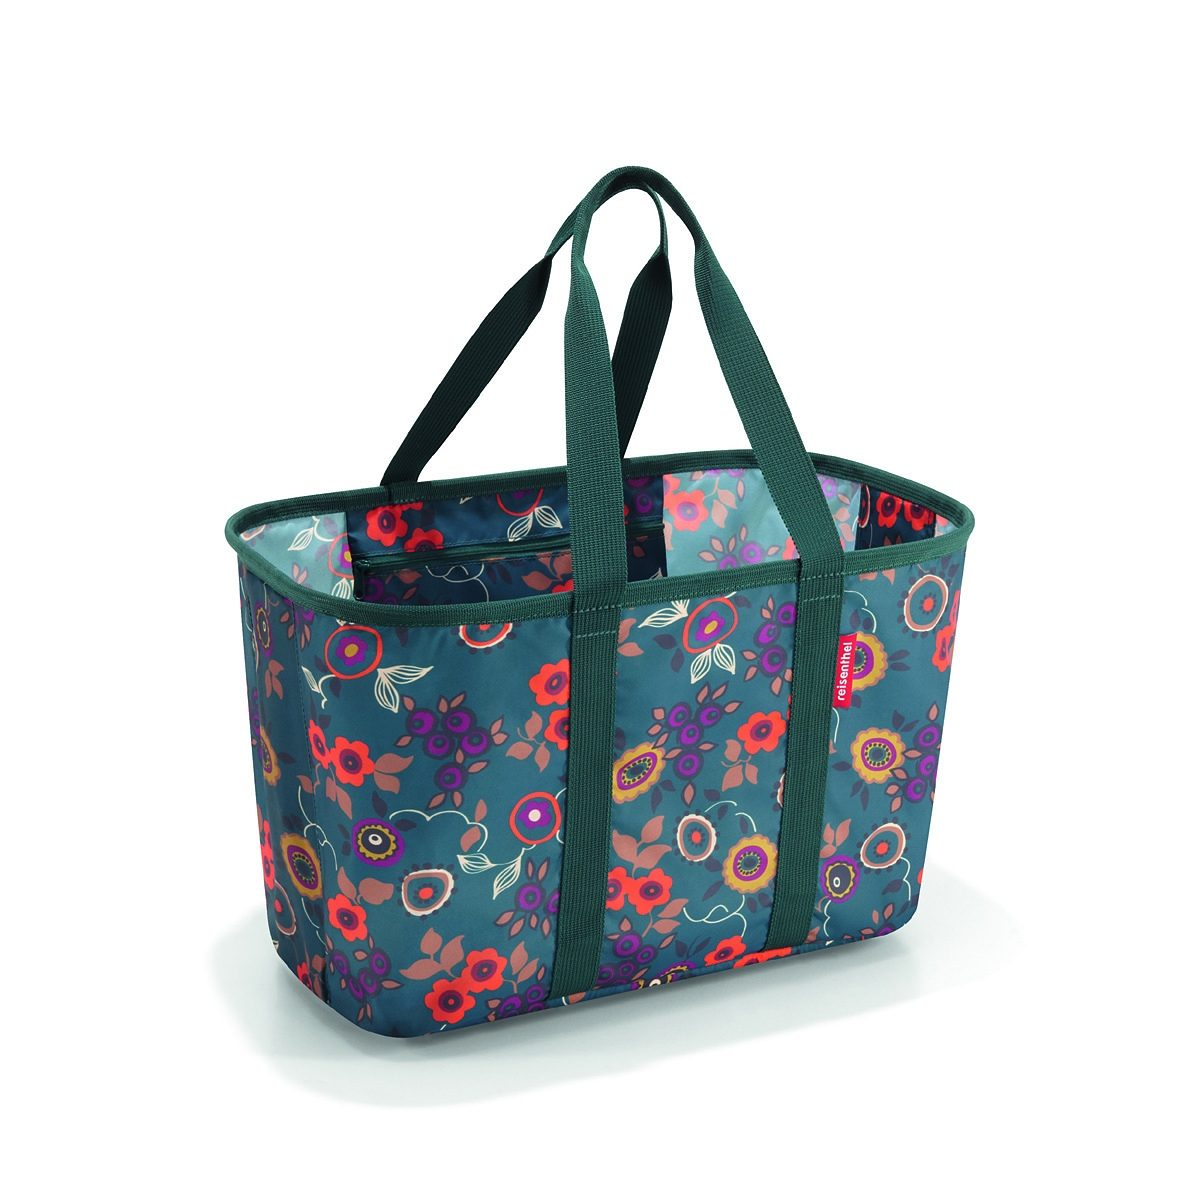 REISENTHEL® Reisenthel Mini Maxi Basket berry jade